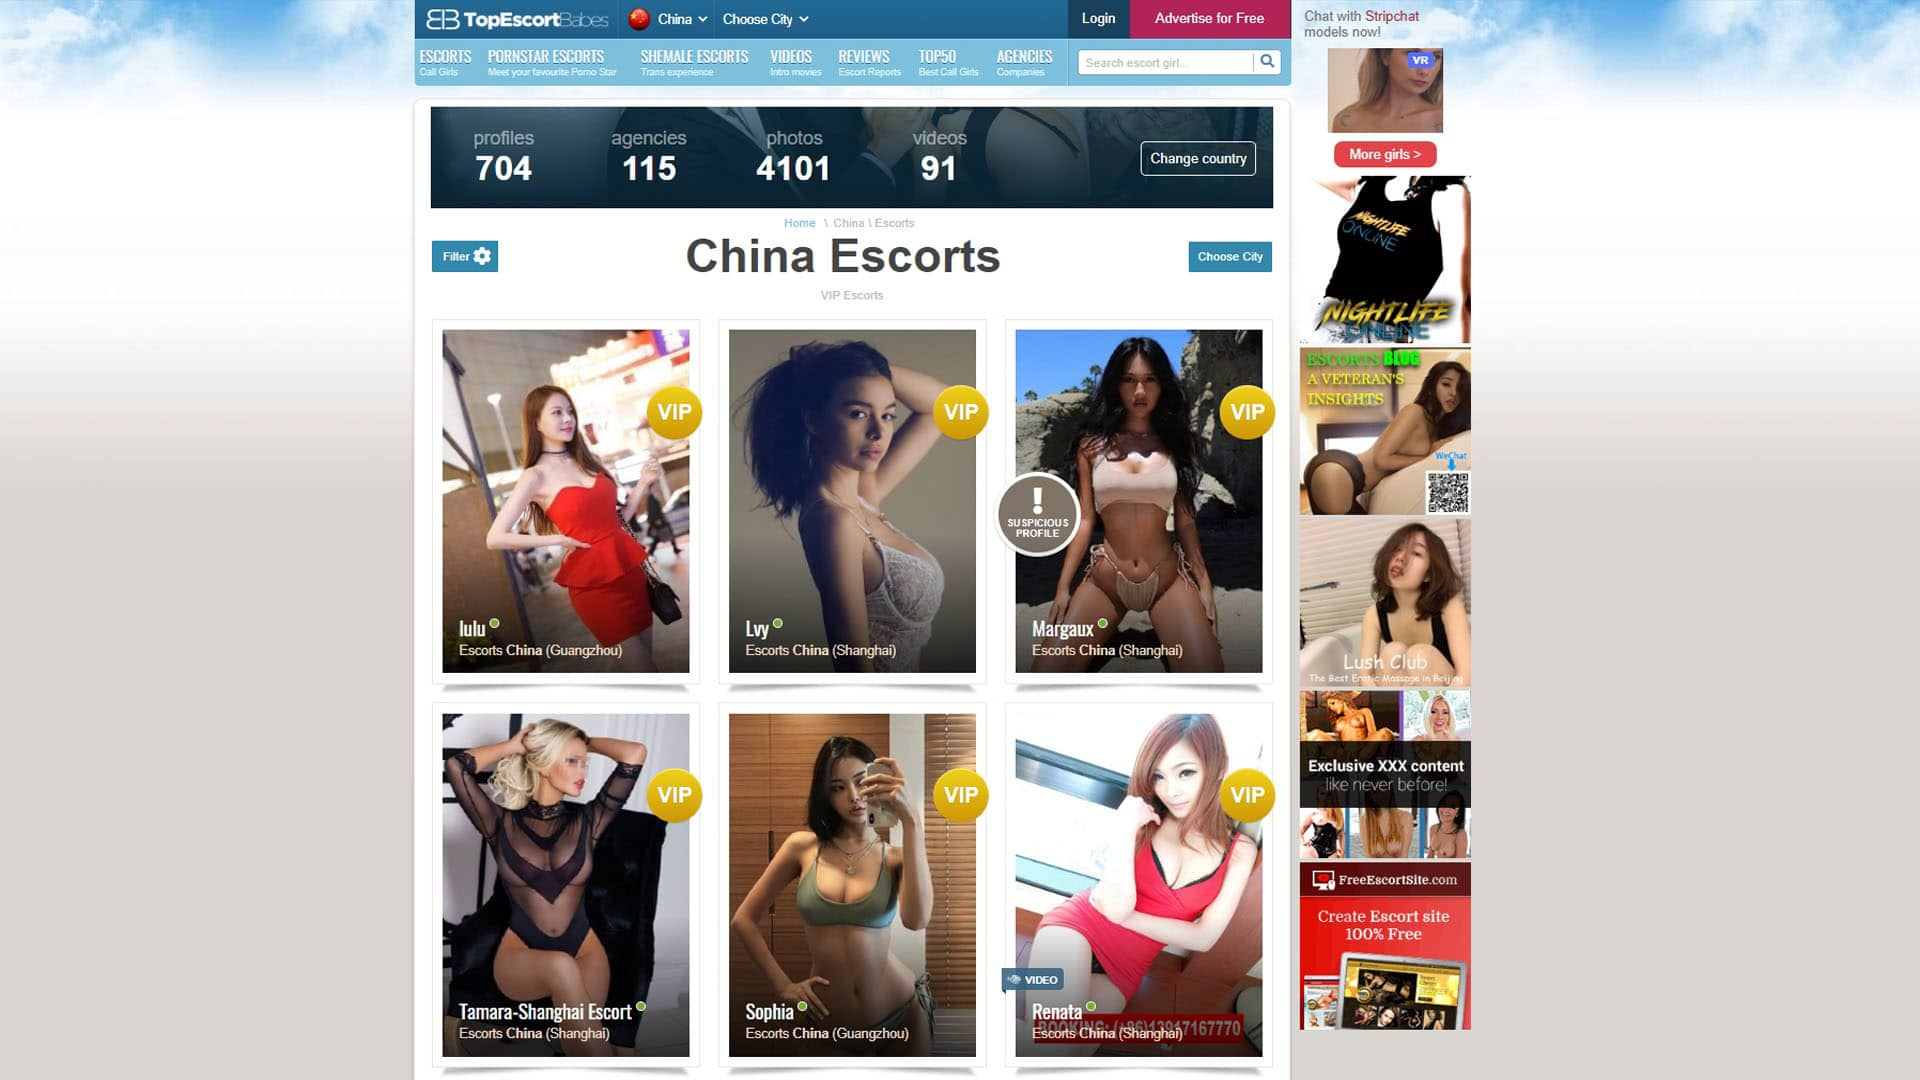 TopEscortBabes China Escorts